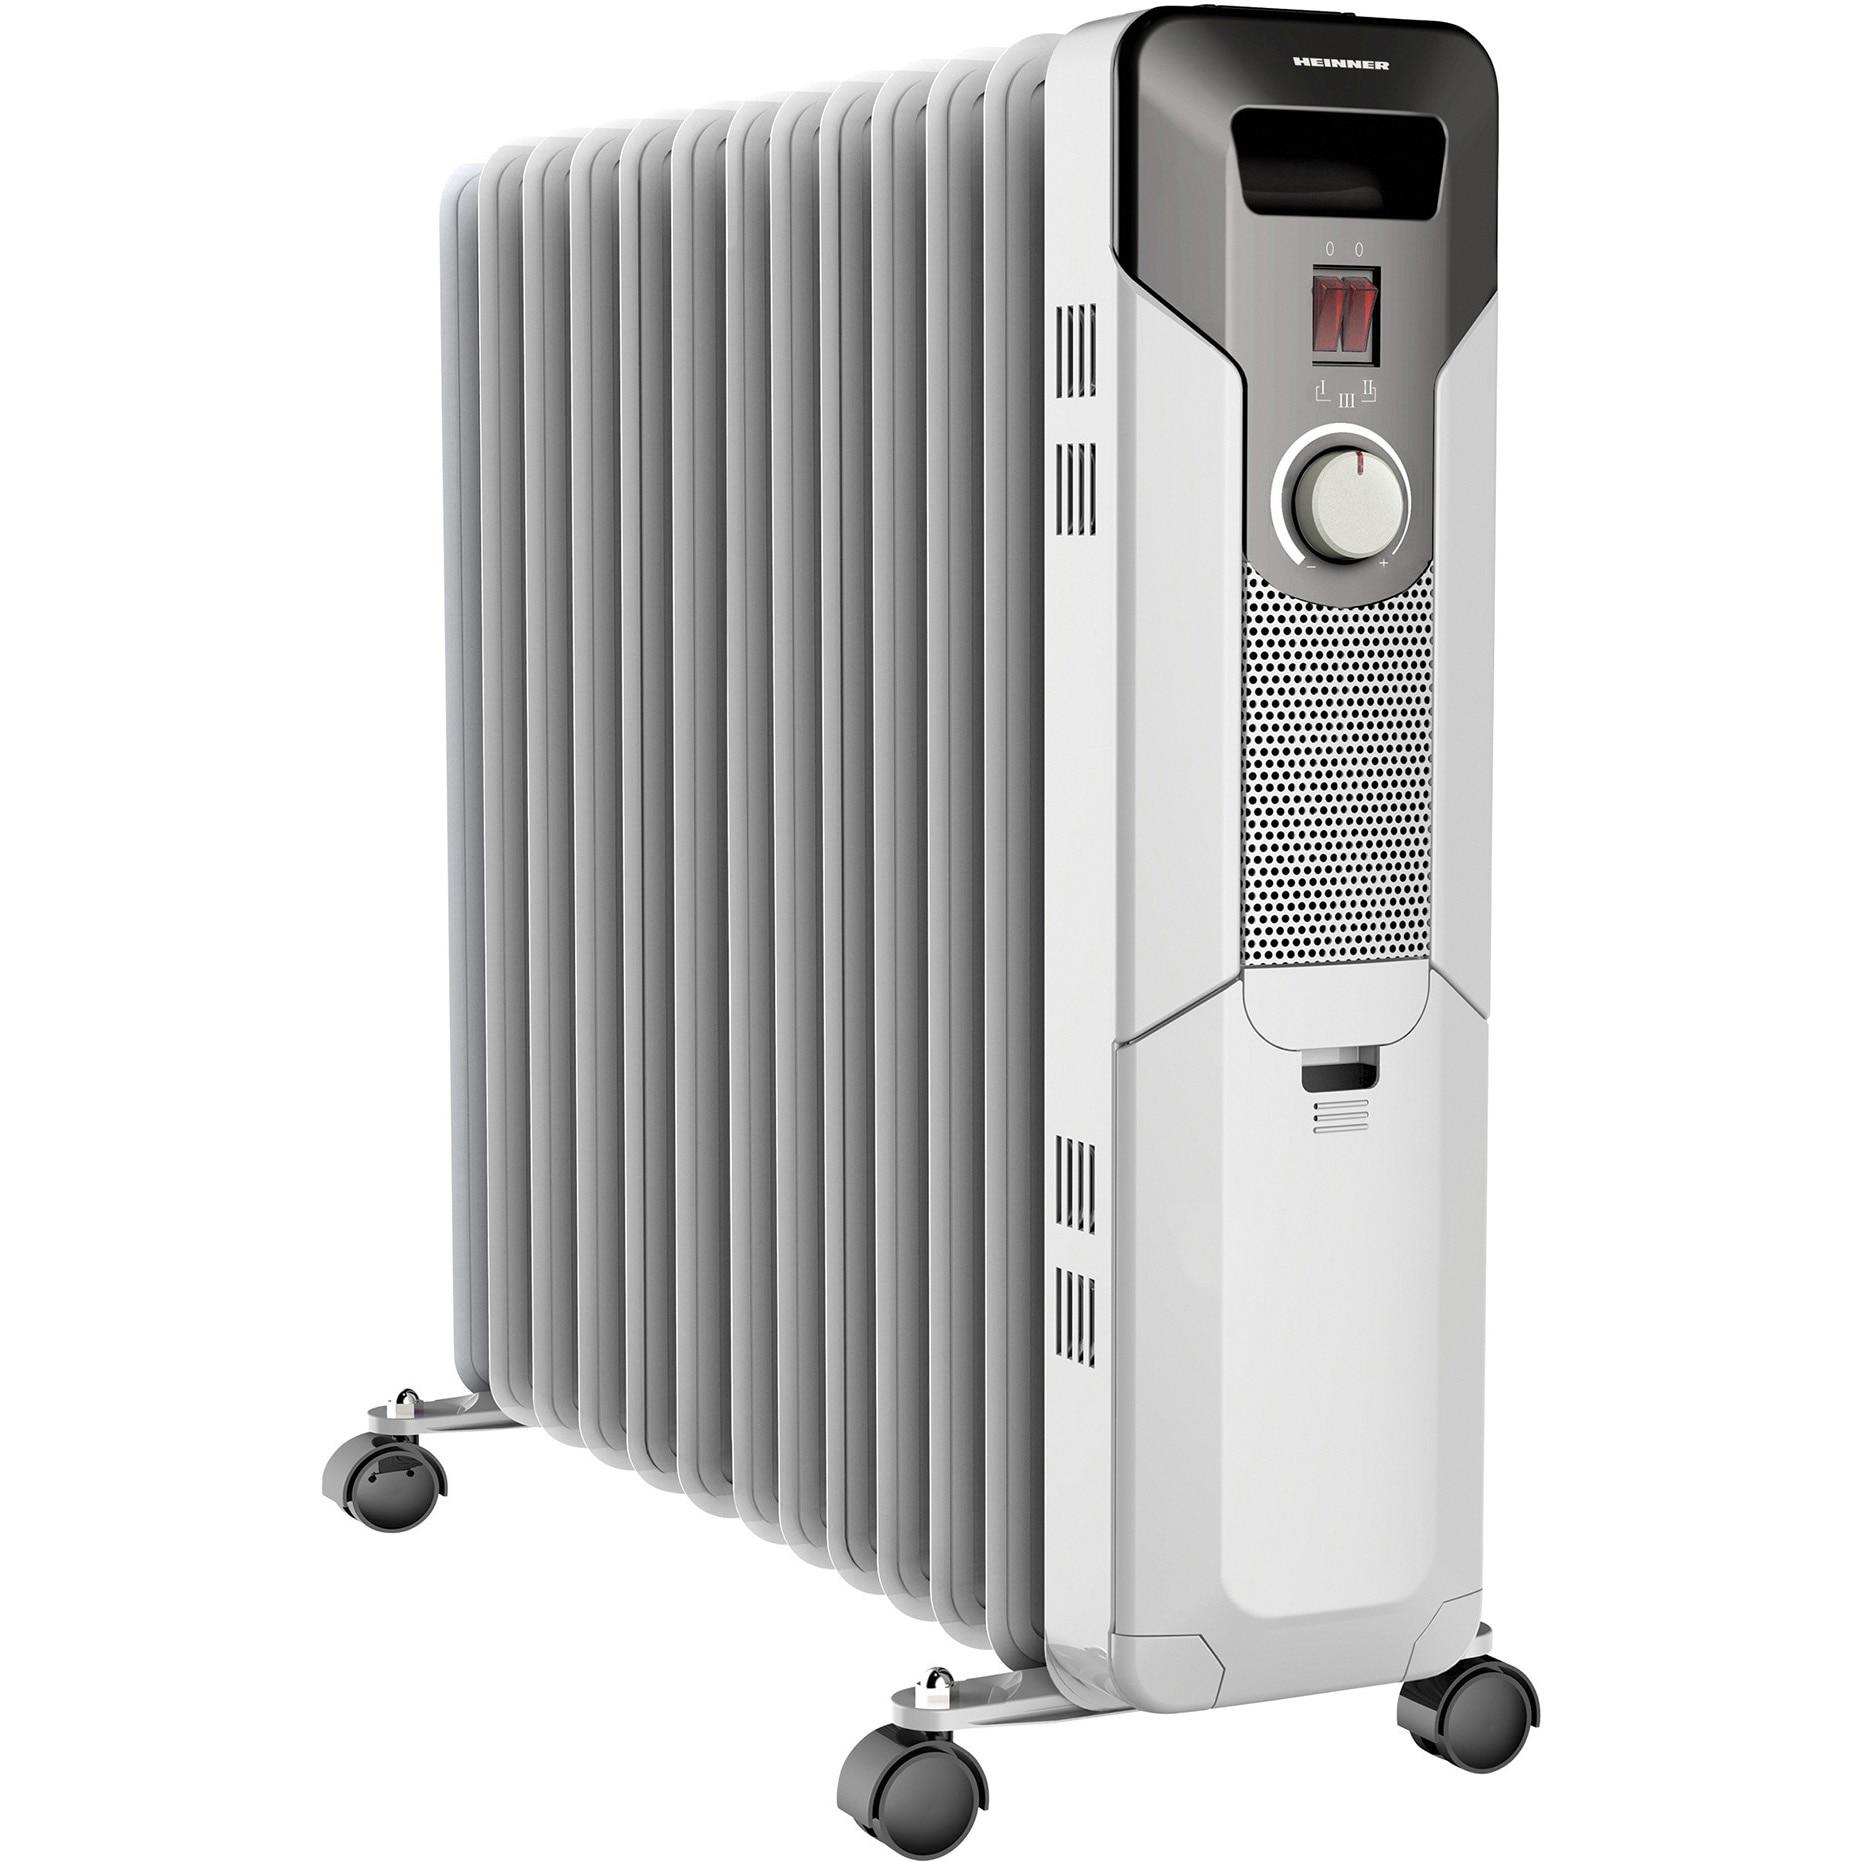 Fotografie Calorifer electric cu ulei Heinner HOH-Y13S, 2500 W, 13 elementi, protectie supraincalzire, termostat reglabil, alb